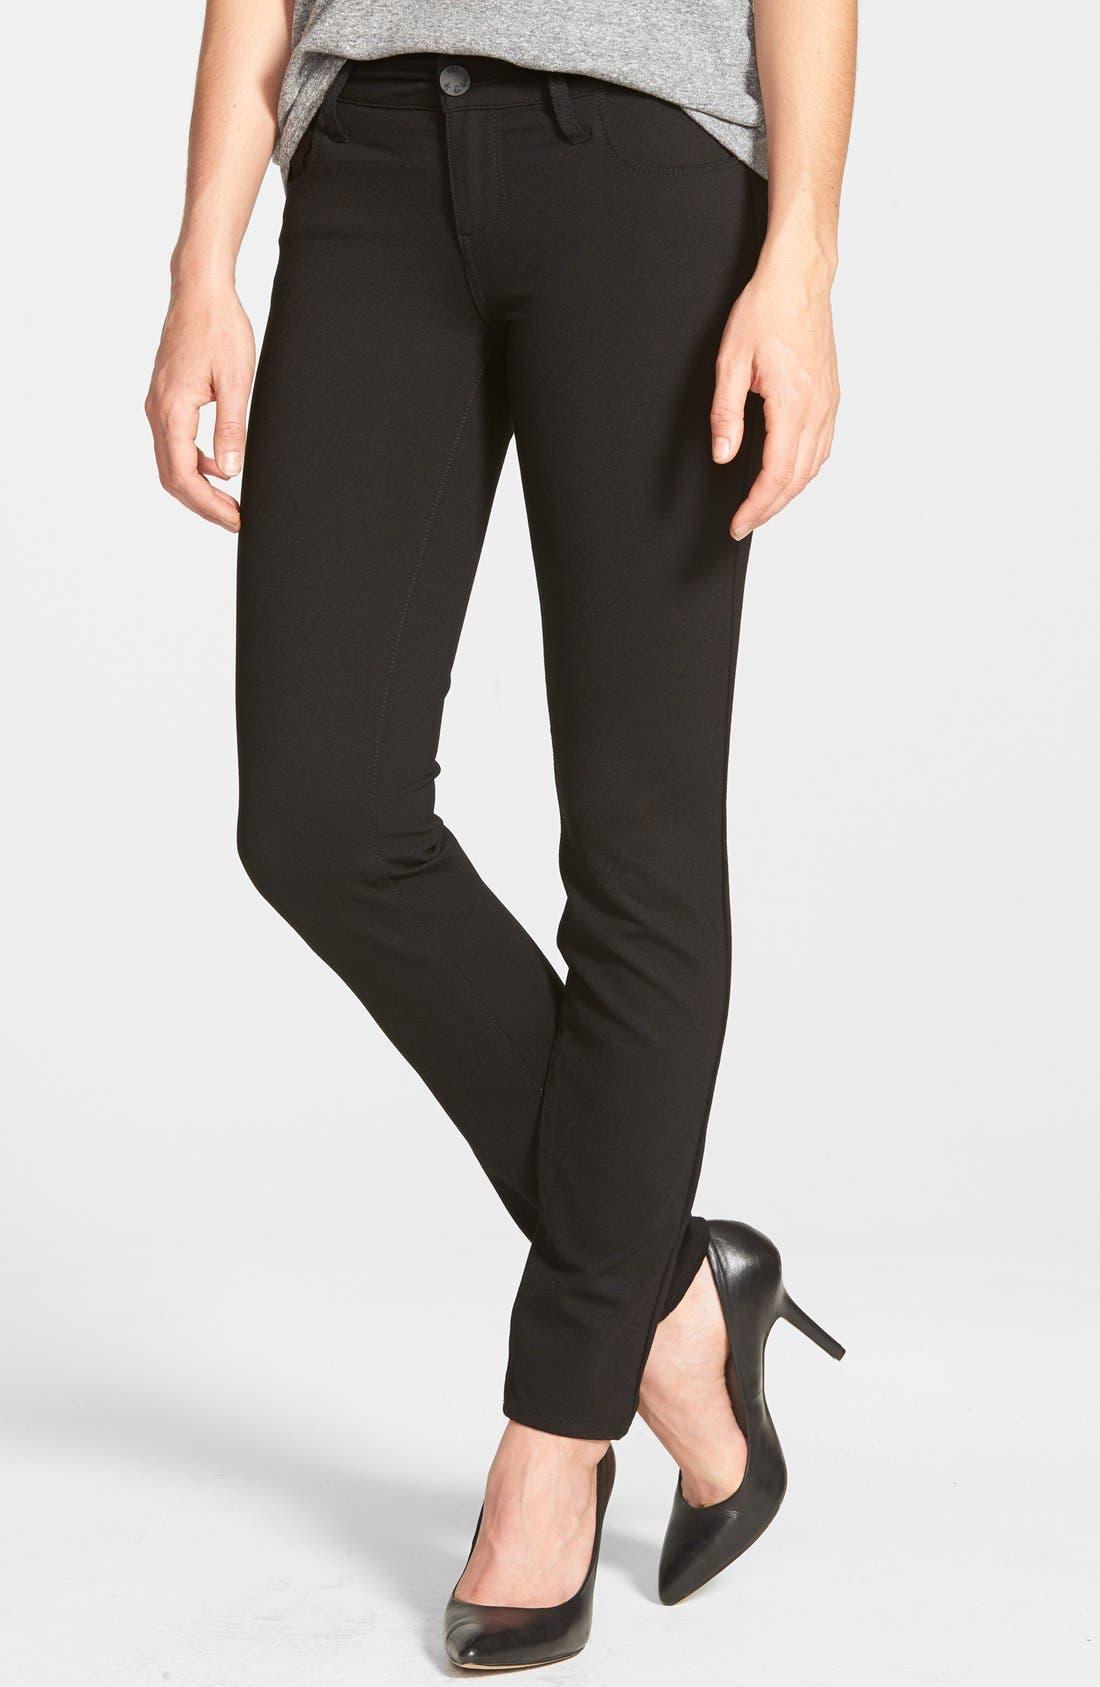 Main Image - KUT from the Kloth 'Mia' Stretch Knit Five-Pocket Skinny Pants